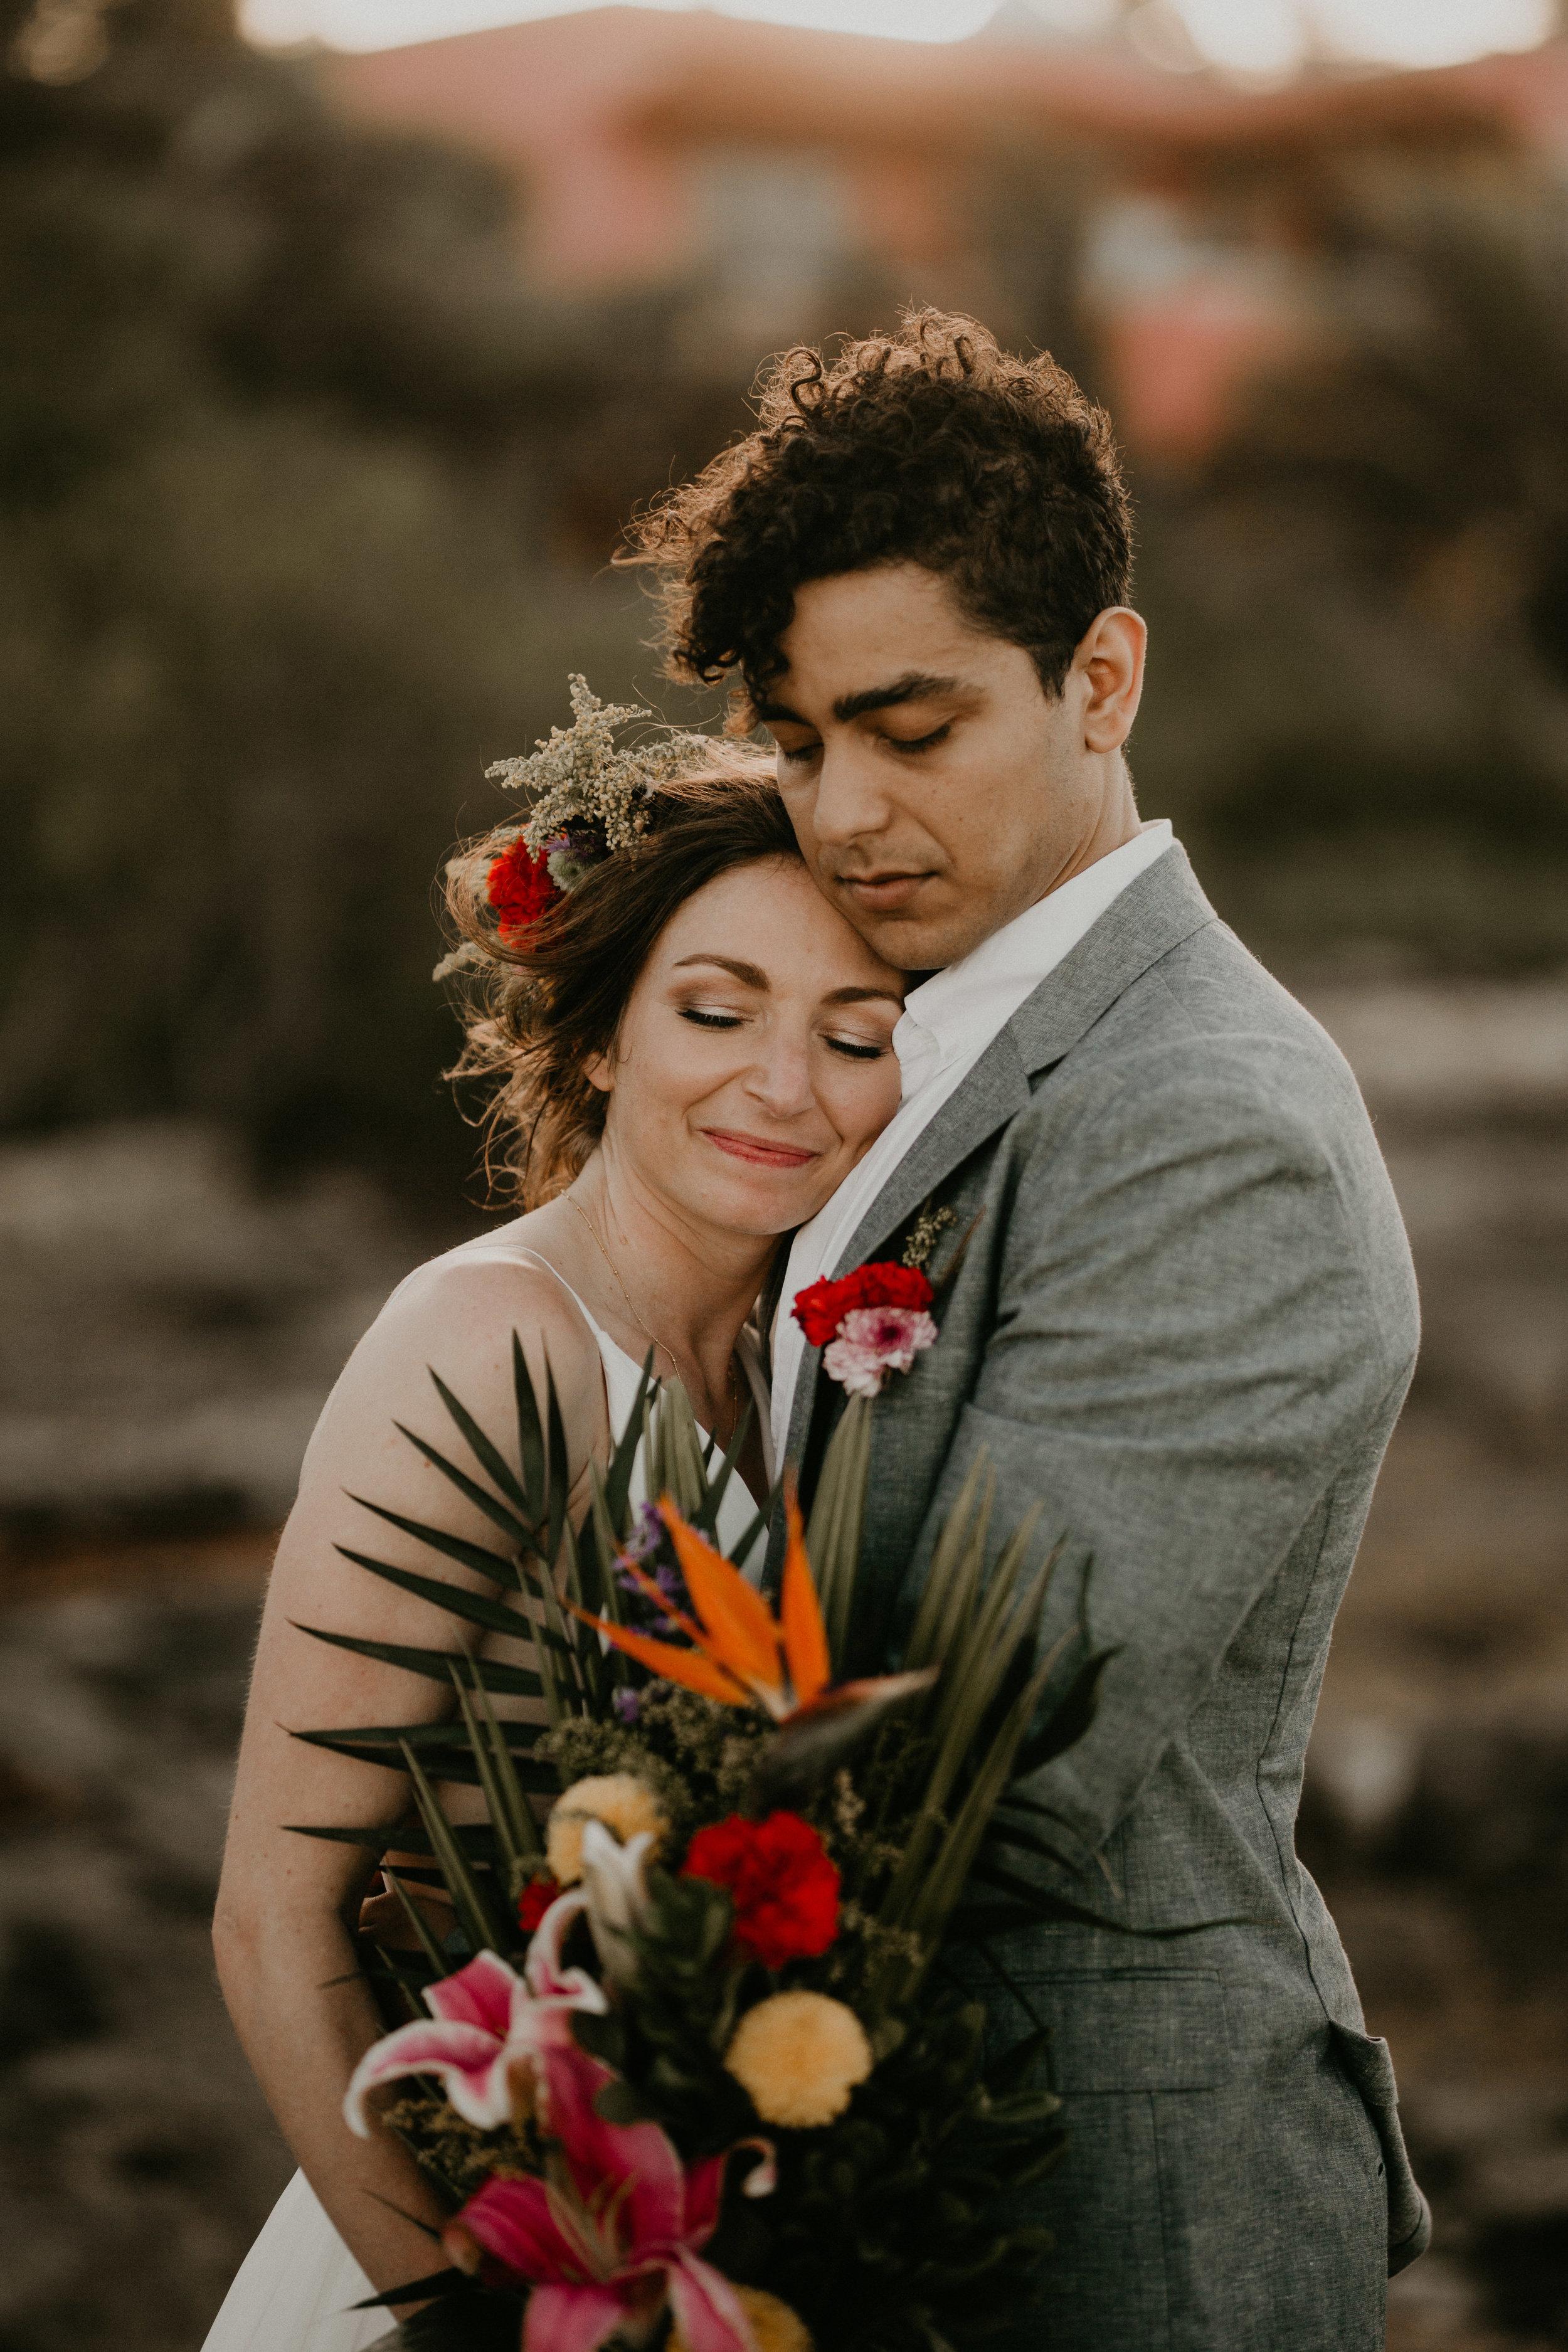 Nicole-Daacke-Photography-beachfront-akumal-destionation-wedding-tulum-mexico-elopement-photographer-destination-wedding-inspiration-sunset-champagne-pop-boho-bride-ocean-tropical-bohemian-tulum-wedding-photos-190.jpg